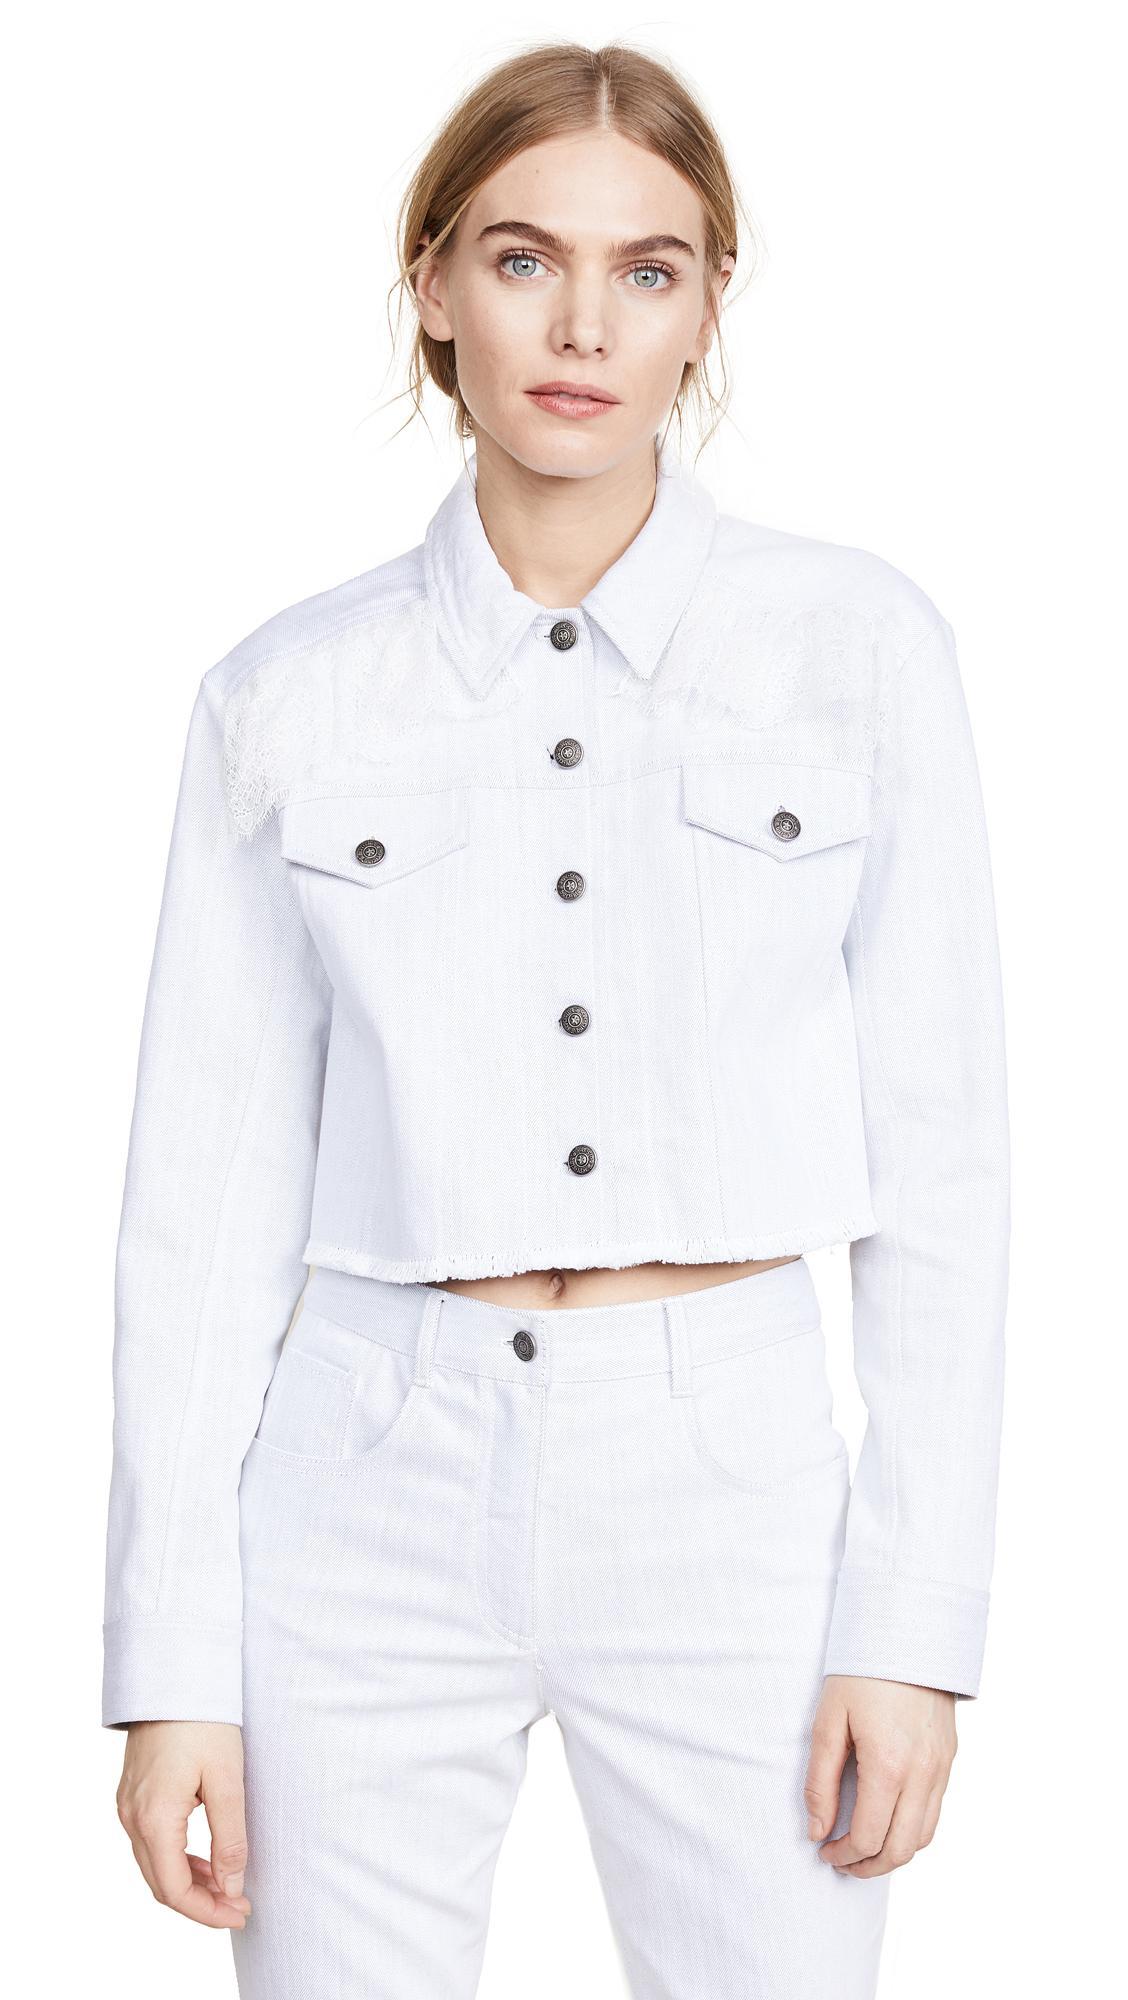 Cinq À Sept Cropped Denim Jacket In White/Ivory